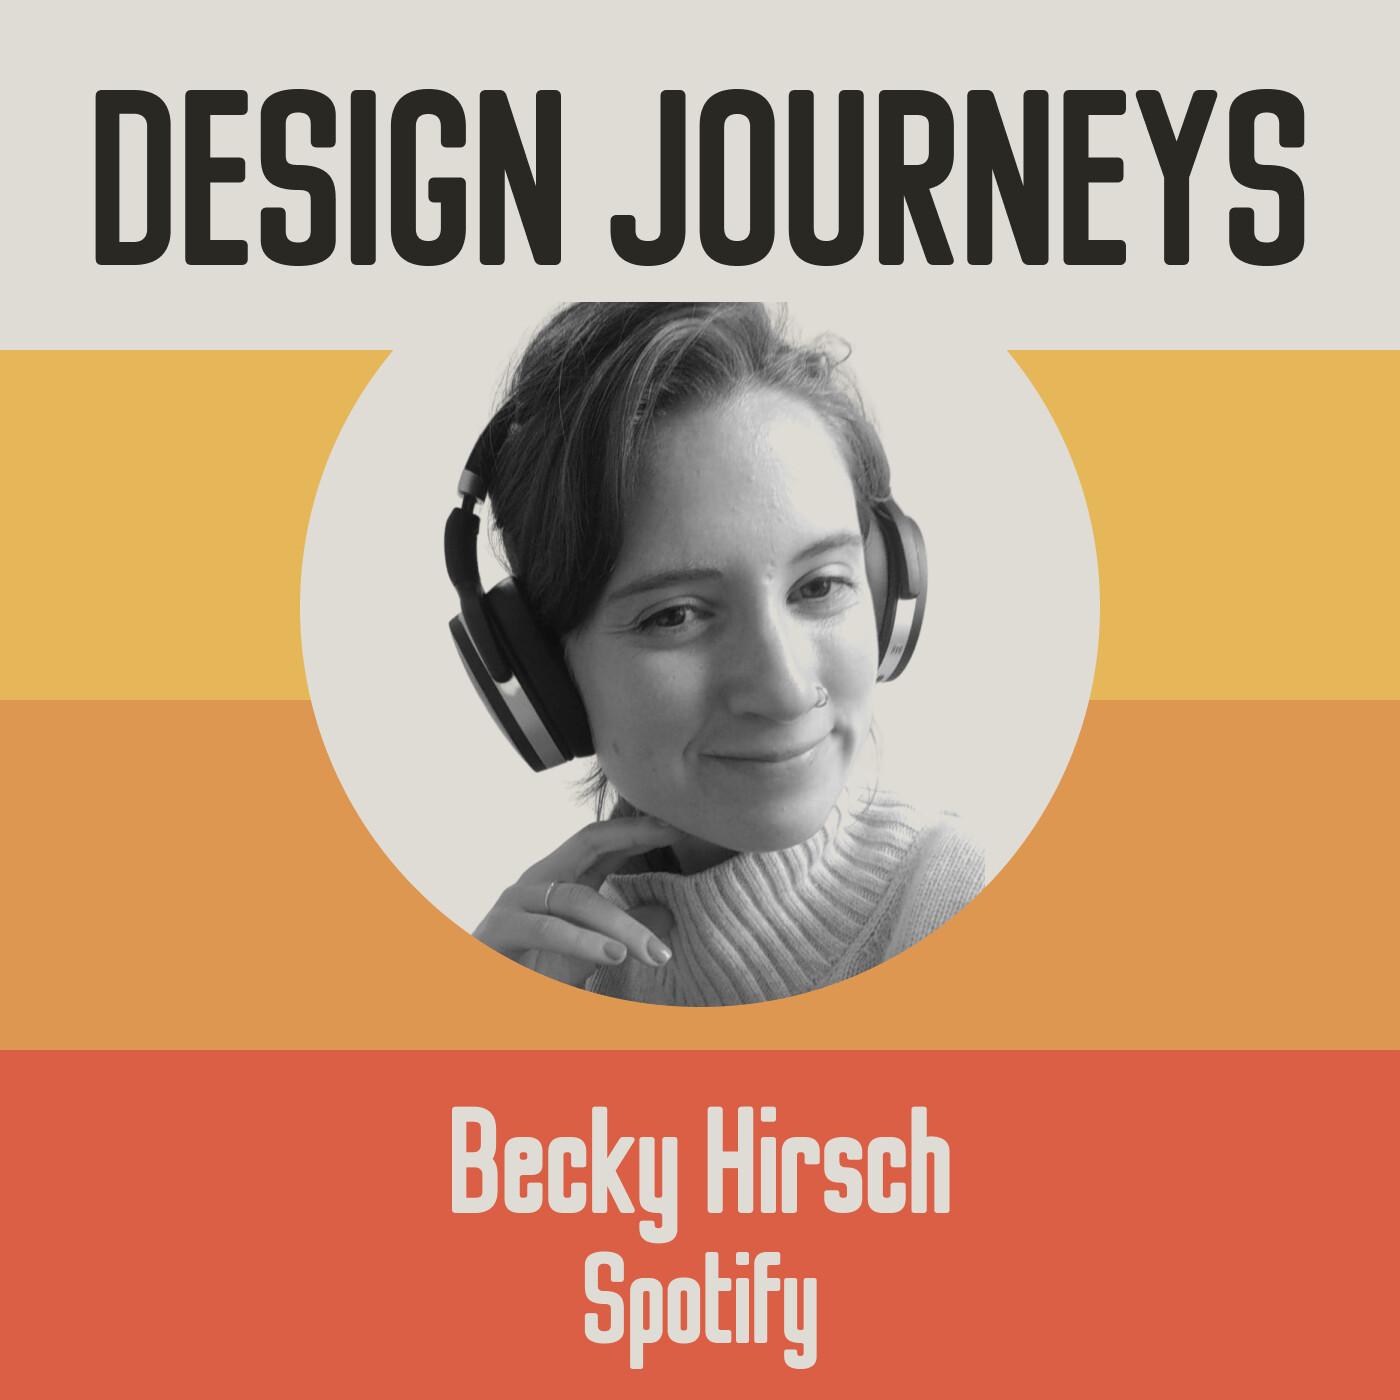 #23 Becky Hirsch - Spotify - Le Content Design en scale-up